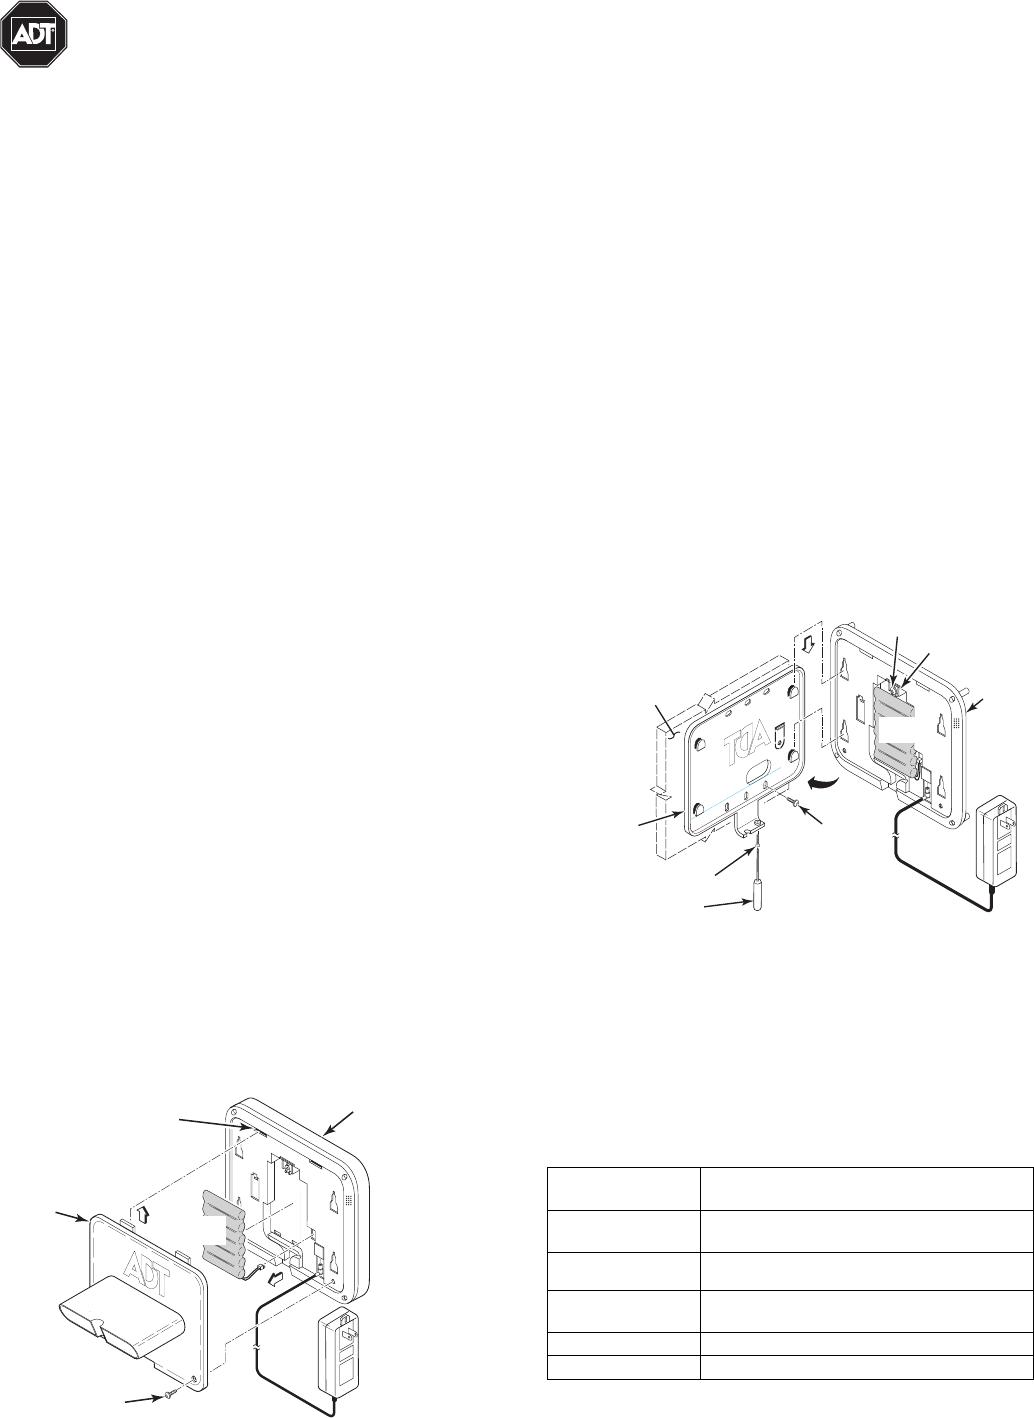 Honeywell 8dltsscbase1 Tssc User Manual 800 13958v1 C Tssc Keypad Ii